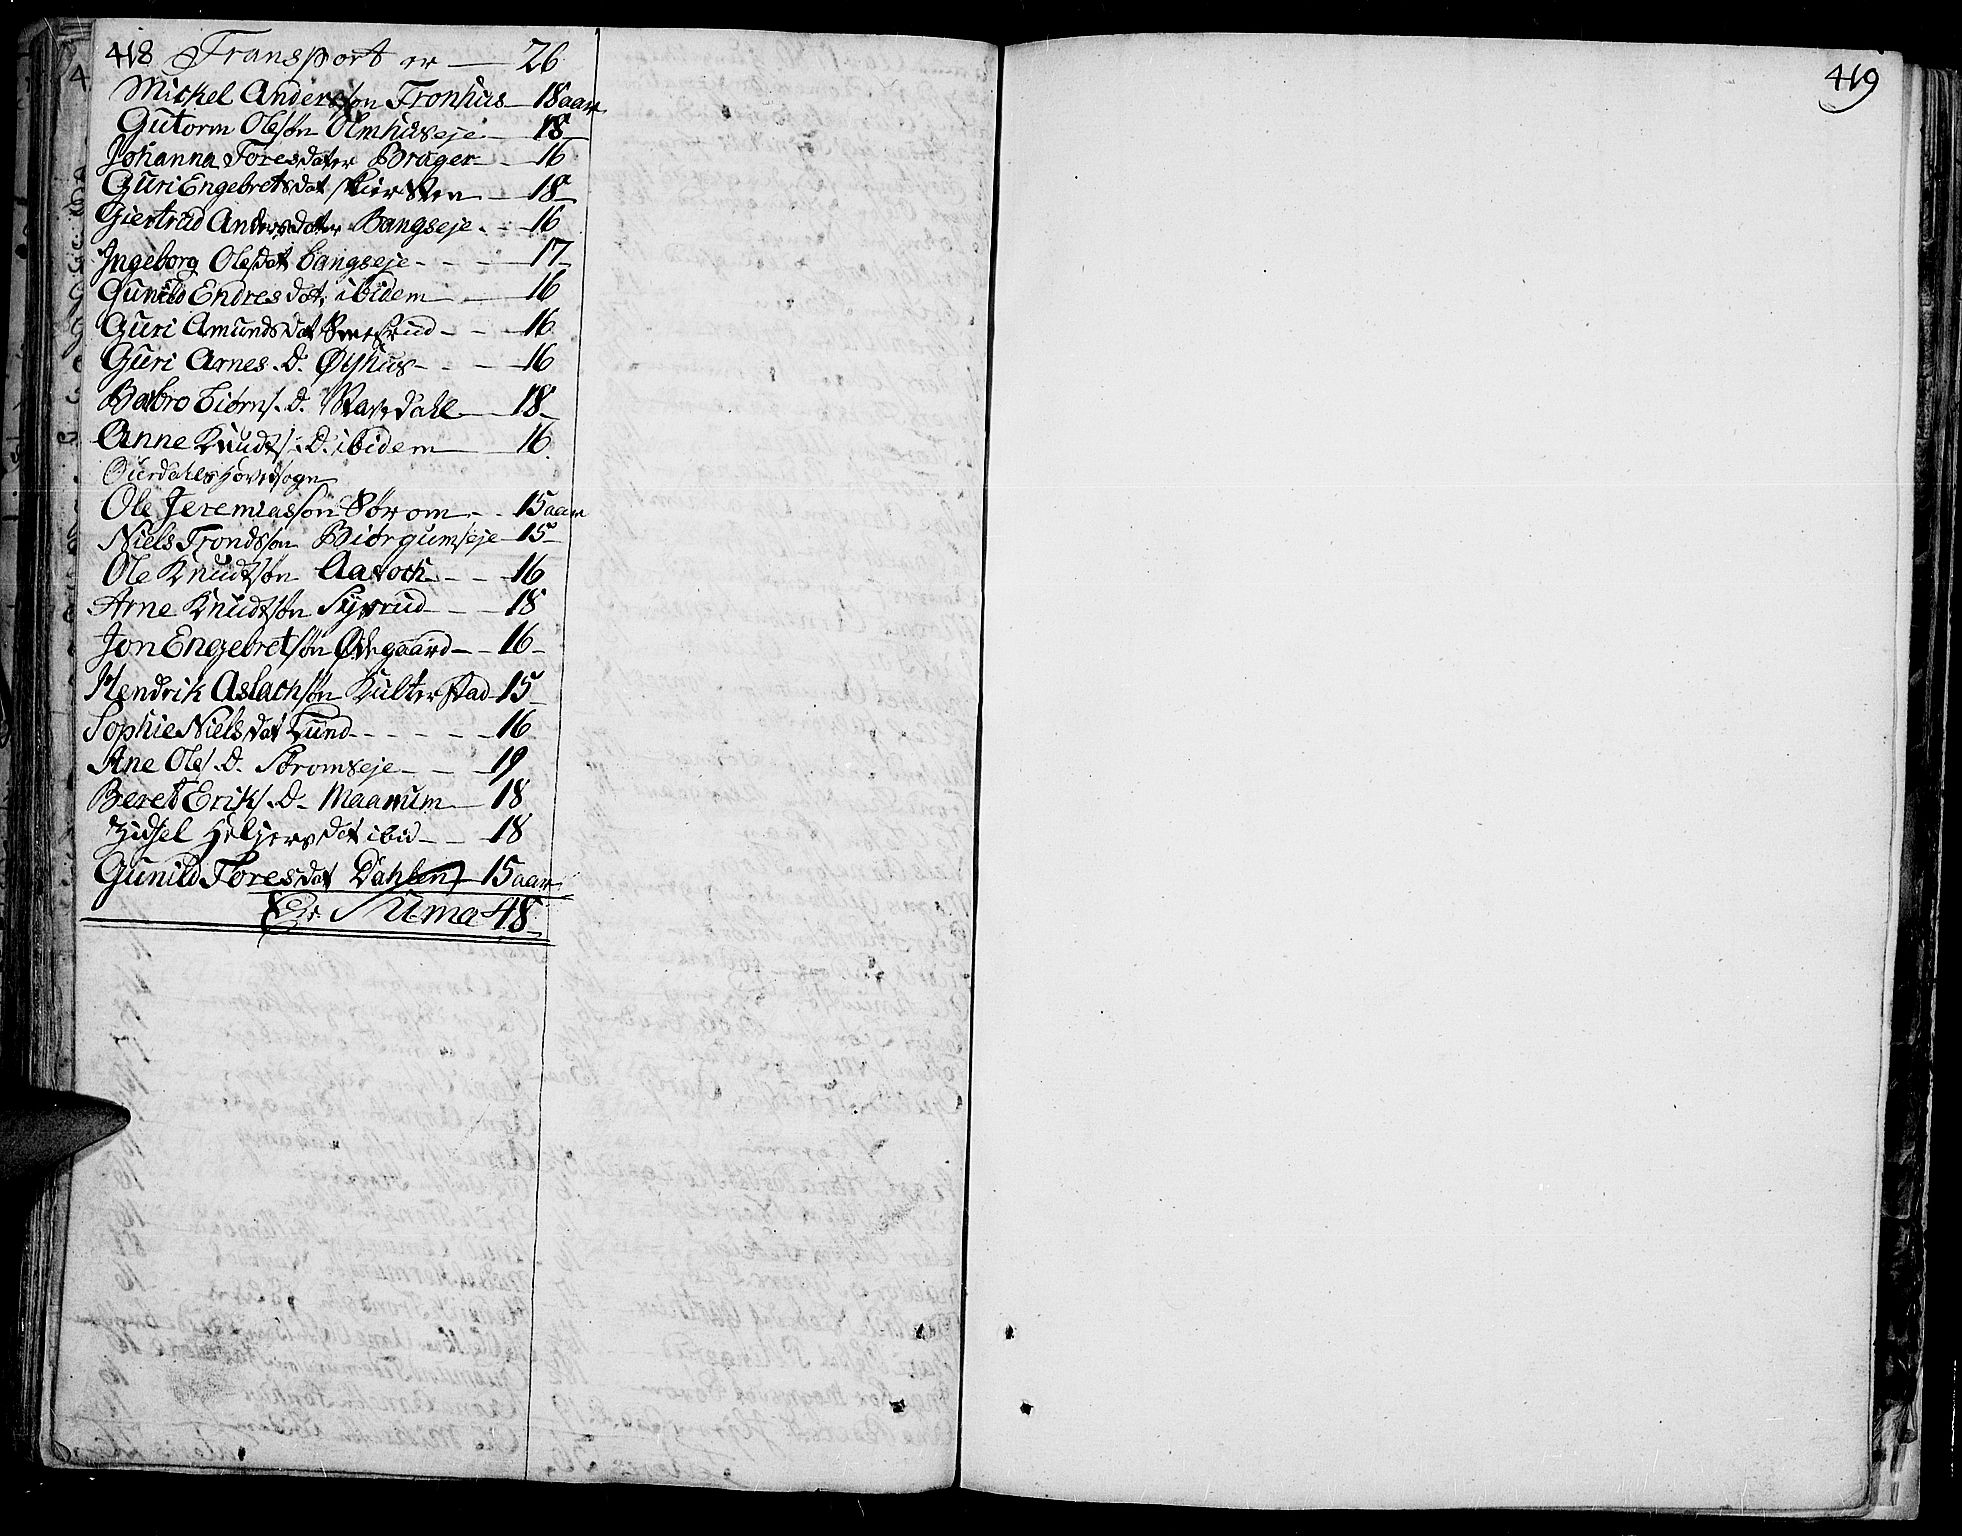 SAH, Aurdal prestekontor, Ministerialbok nr. 5, 1763-1781, s. 418-419